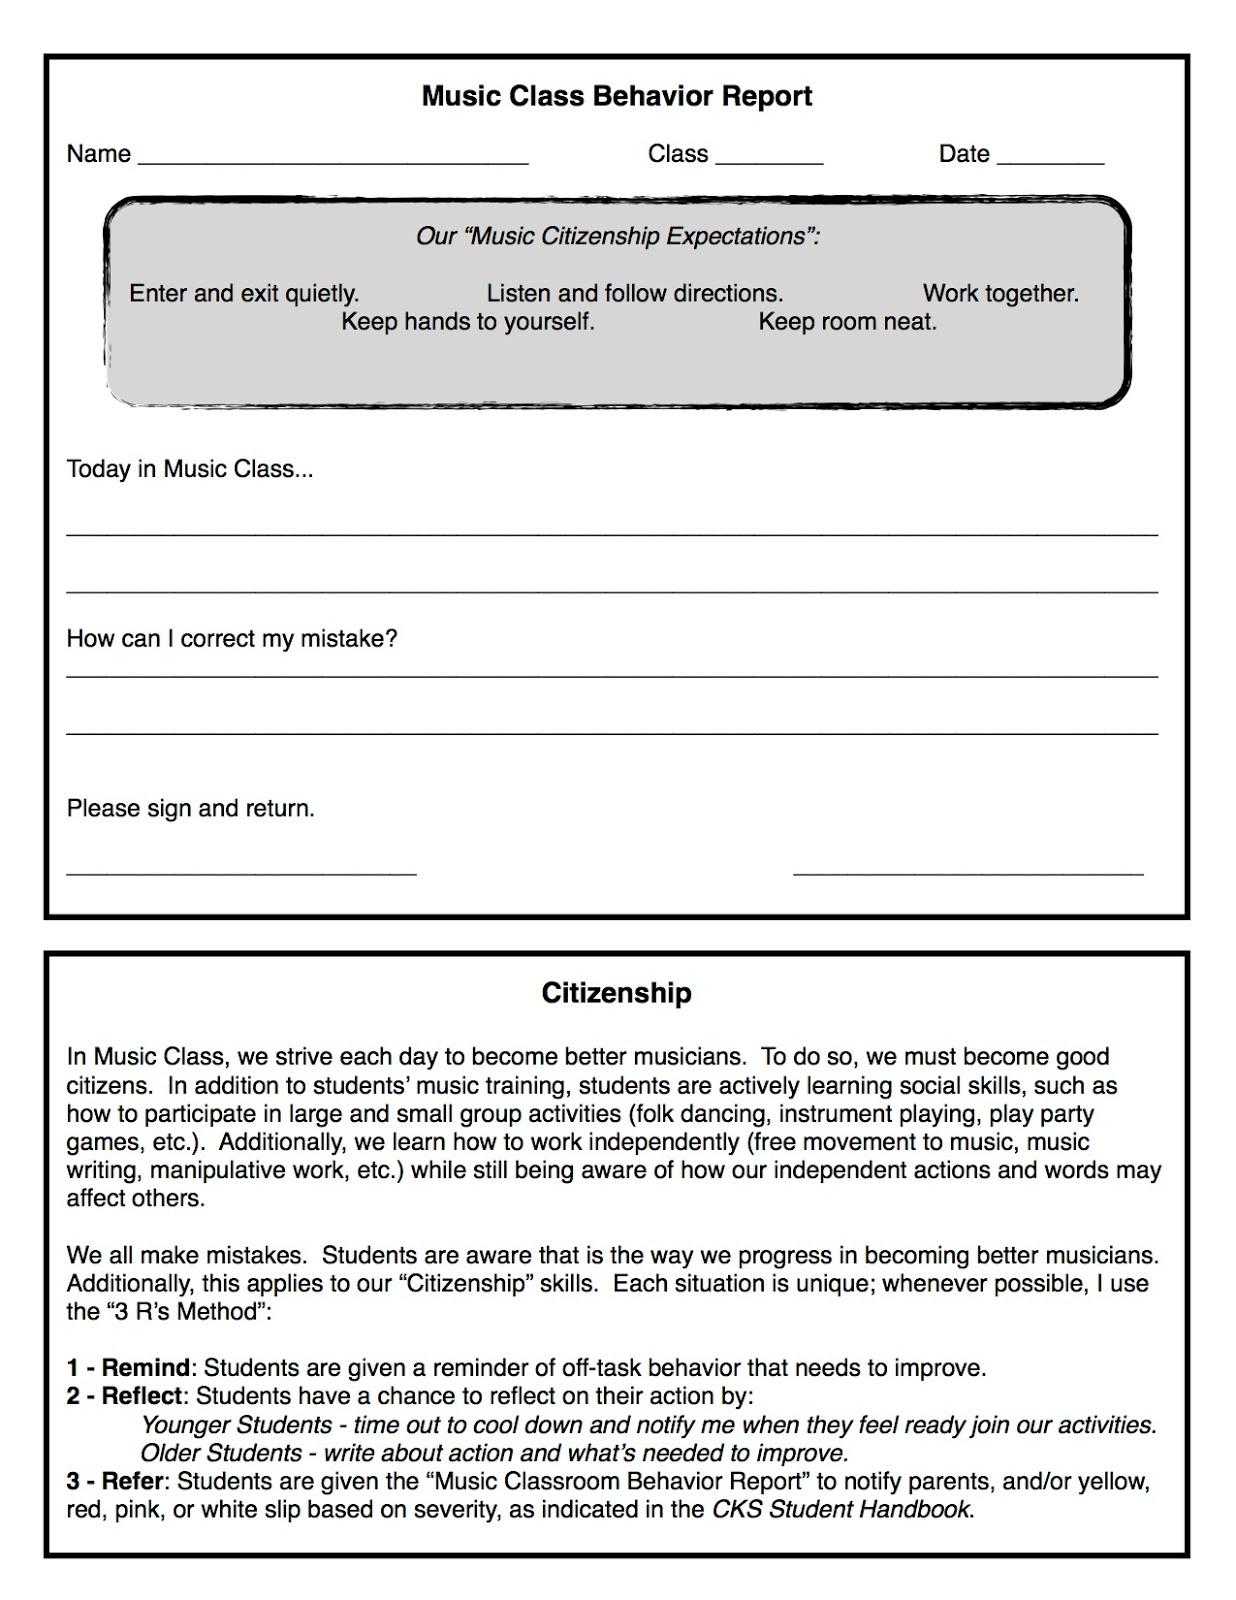 Worksheet Using Should And Shouldn T